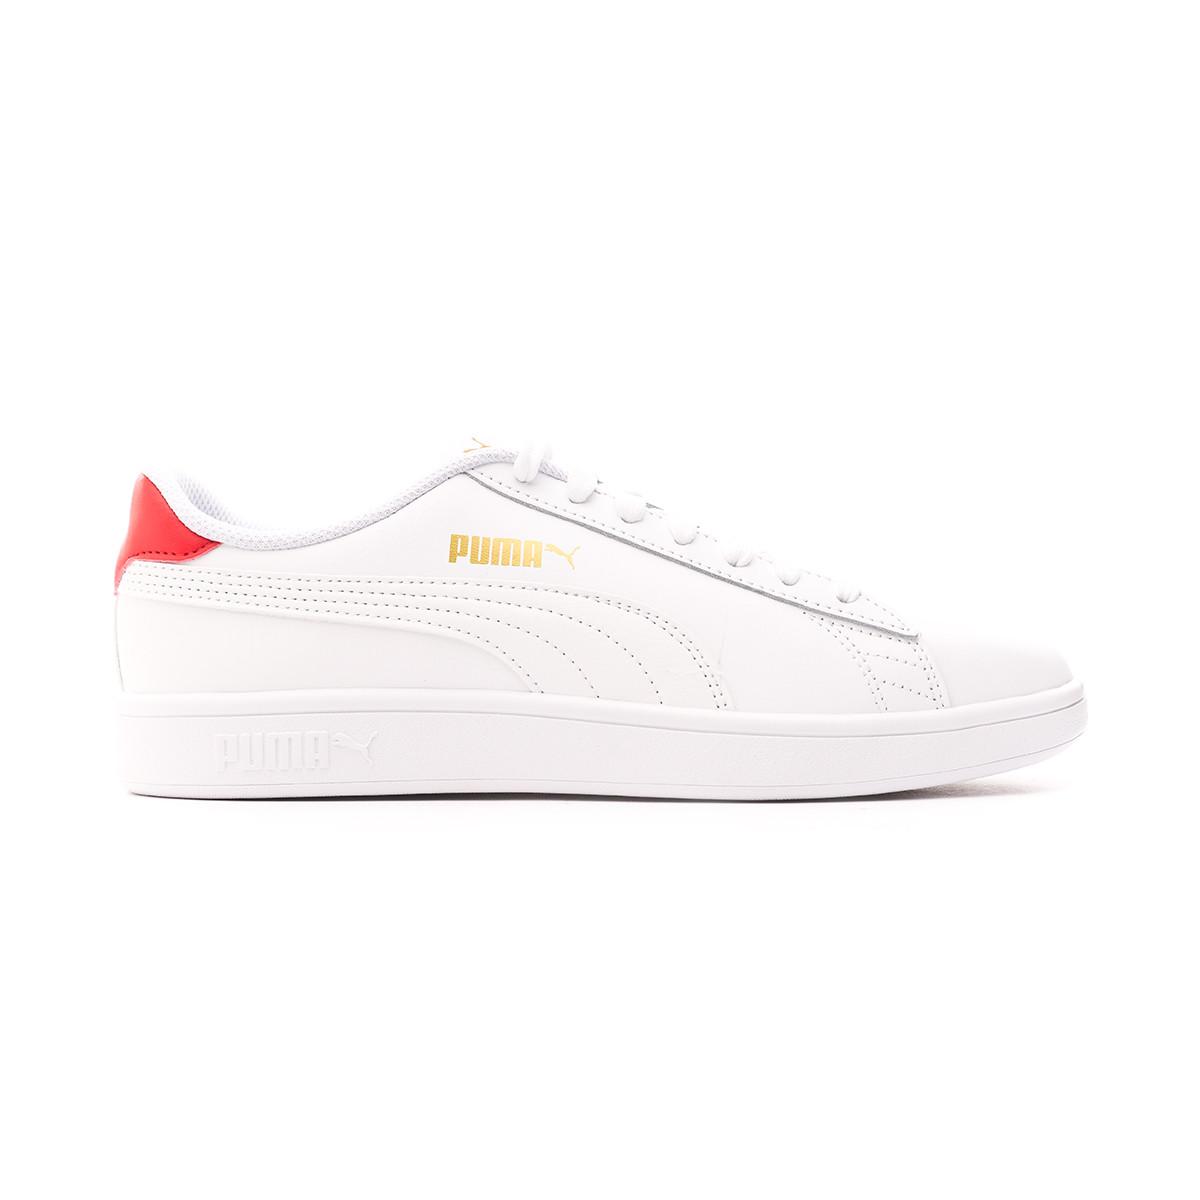 puma white gold trainers